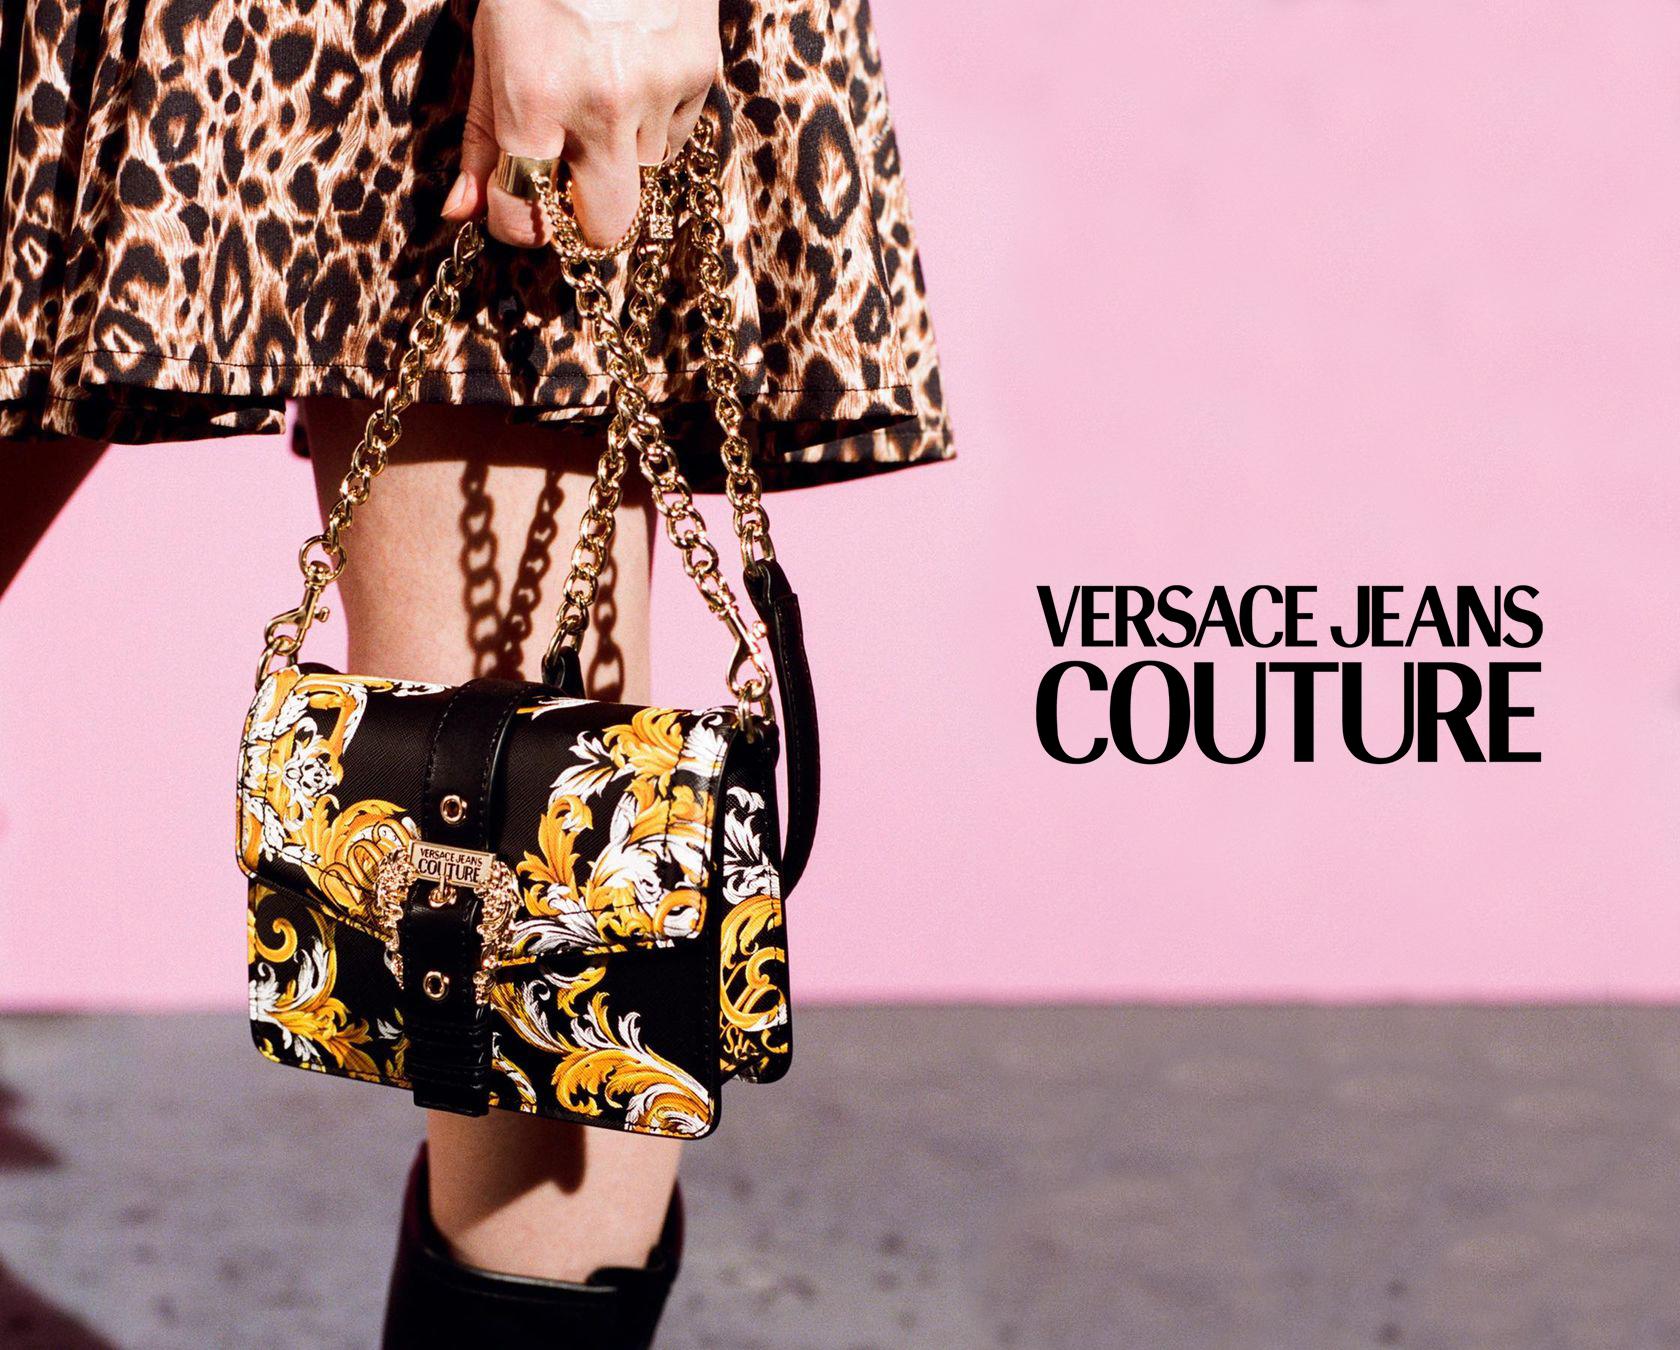 versace banner.jpg